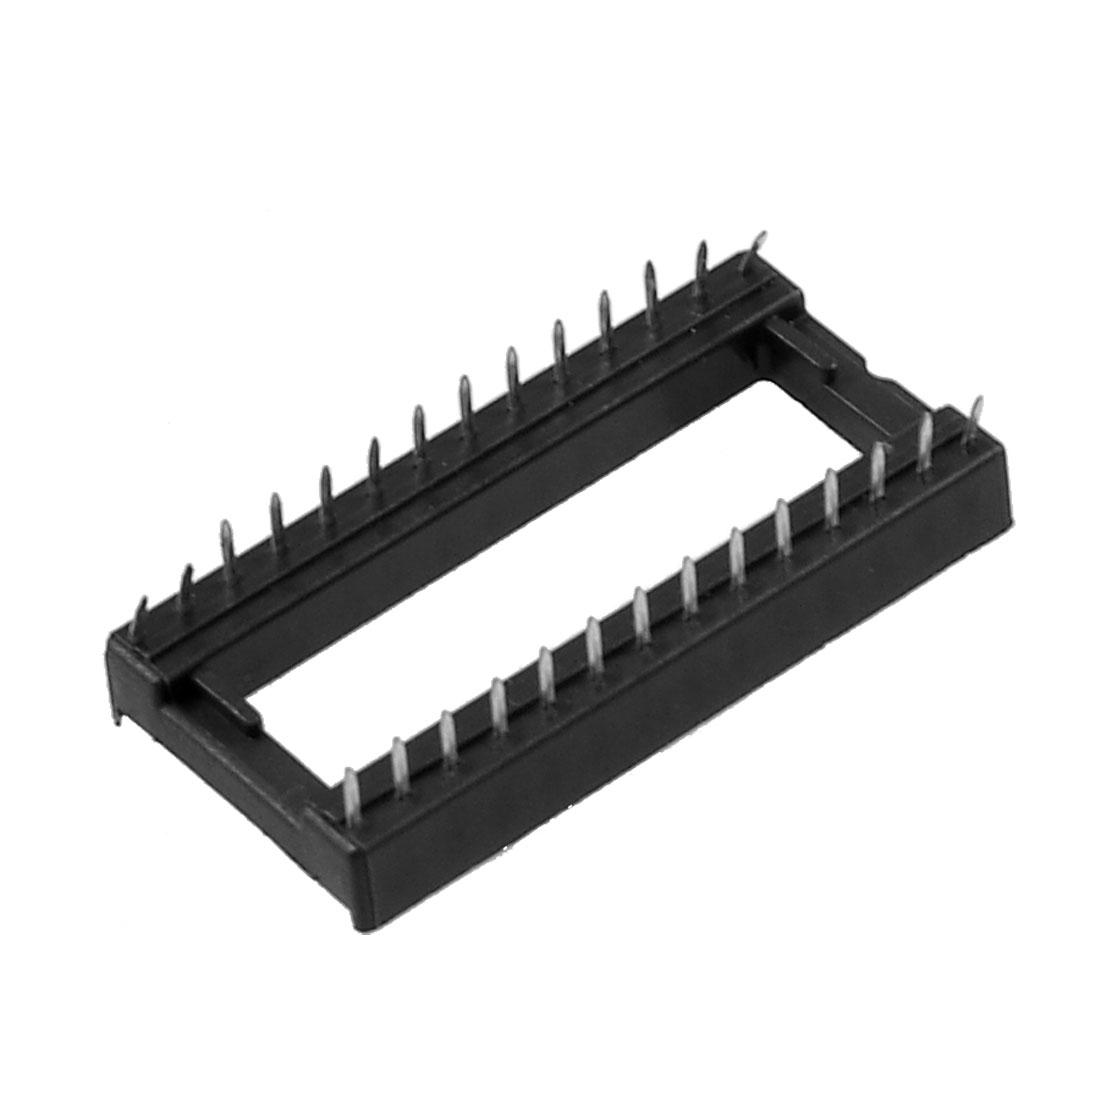 28 Pin 2.54mm Pitch DIP IC Sockets Adaptor Solder Type Socket